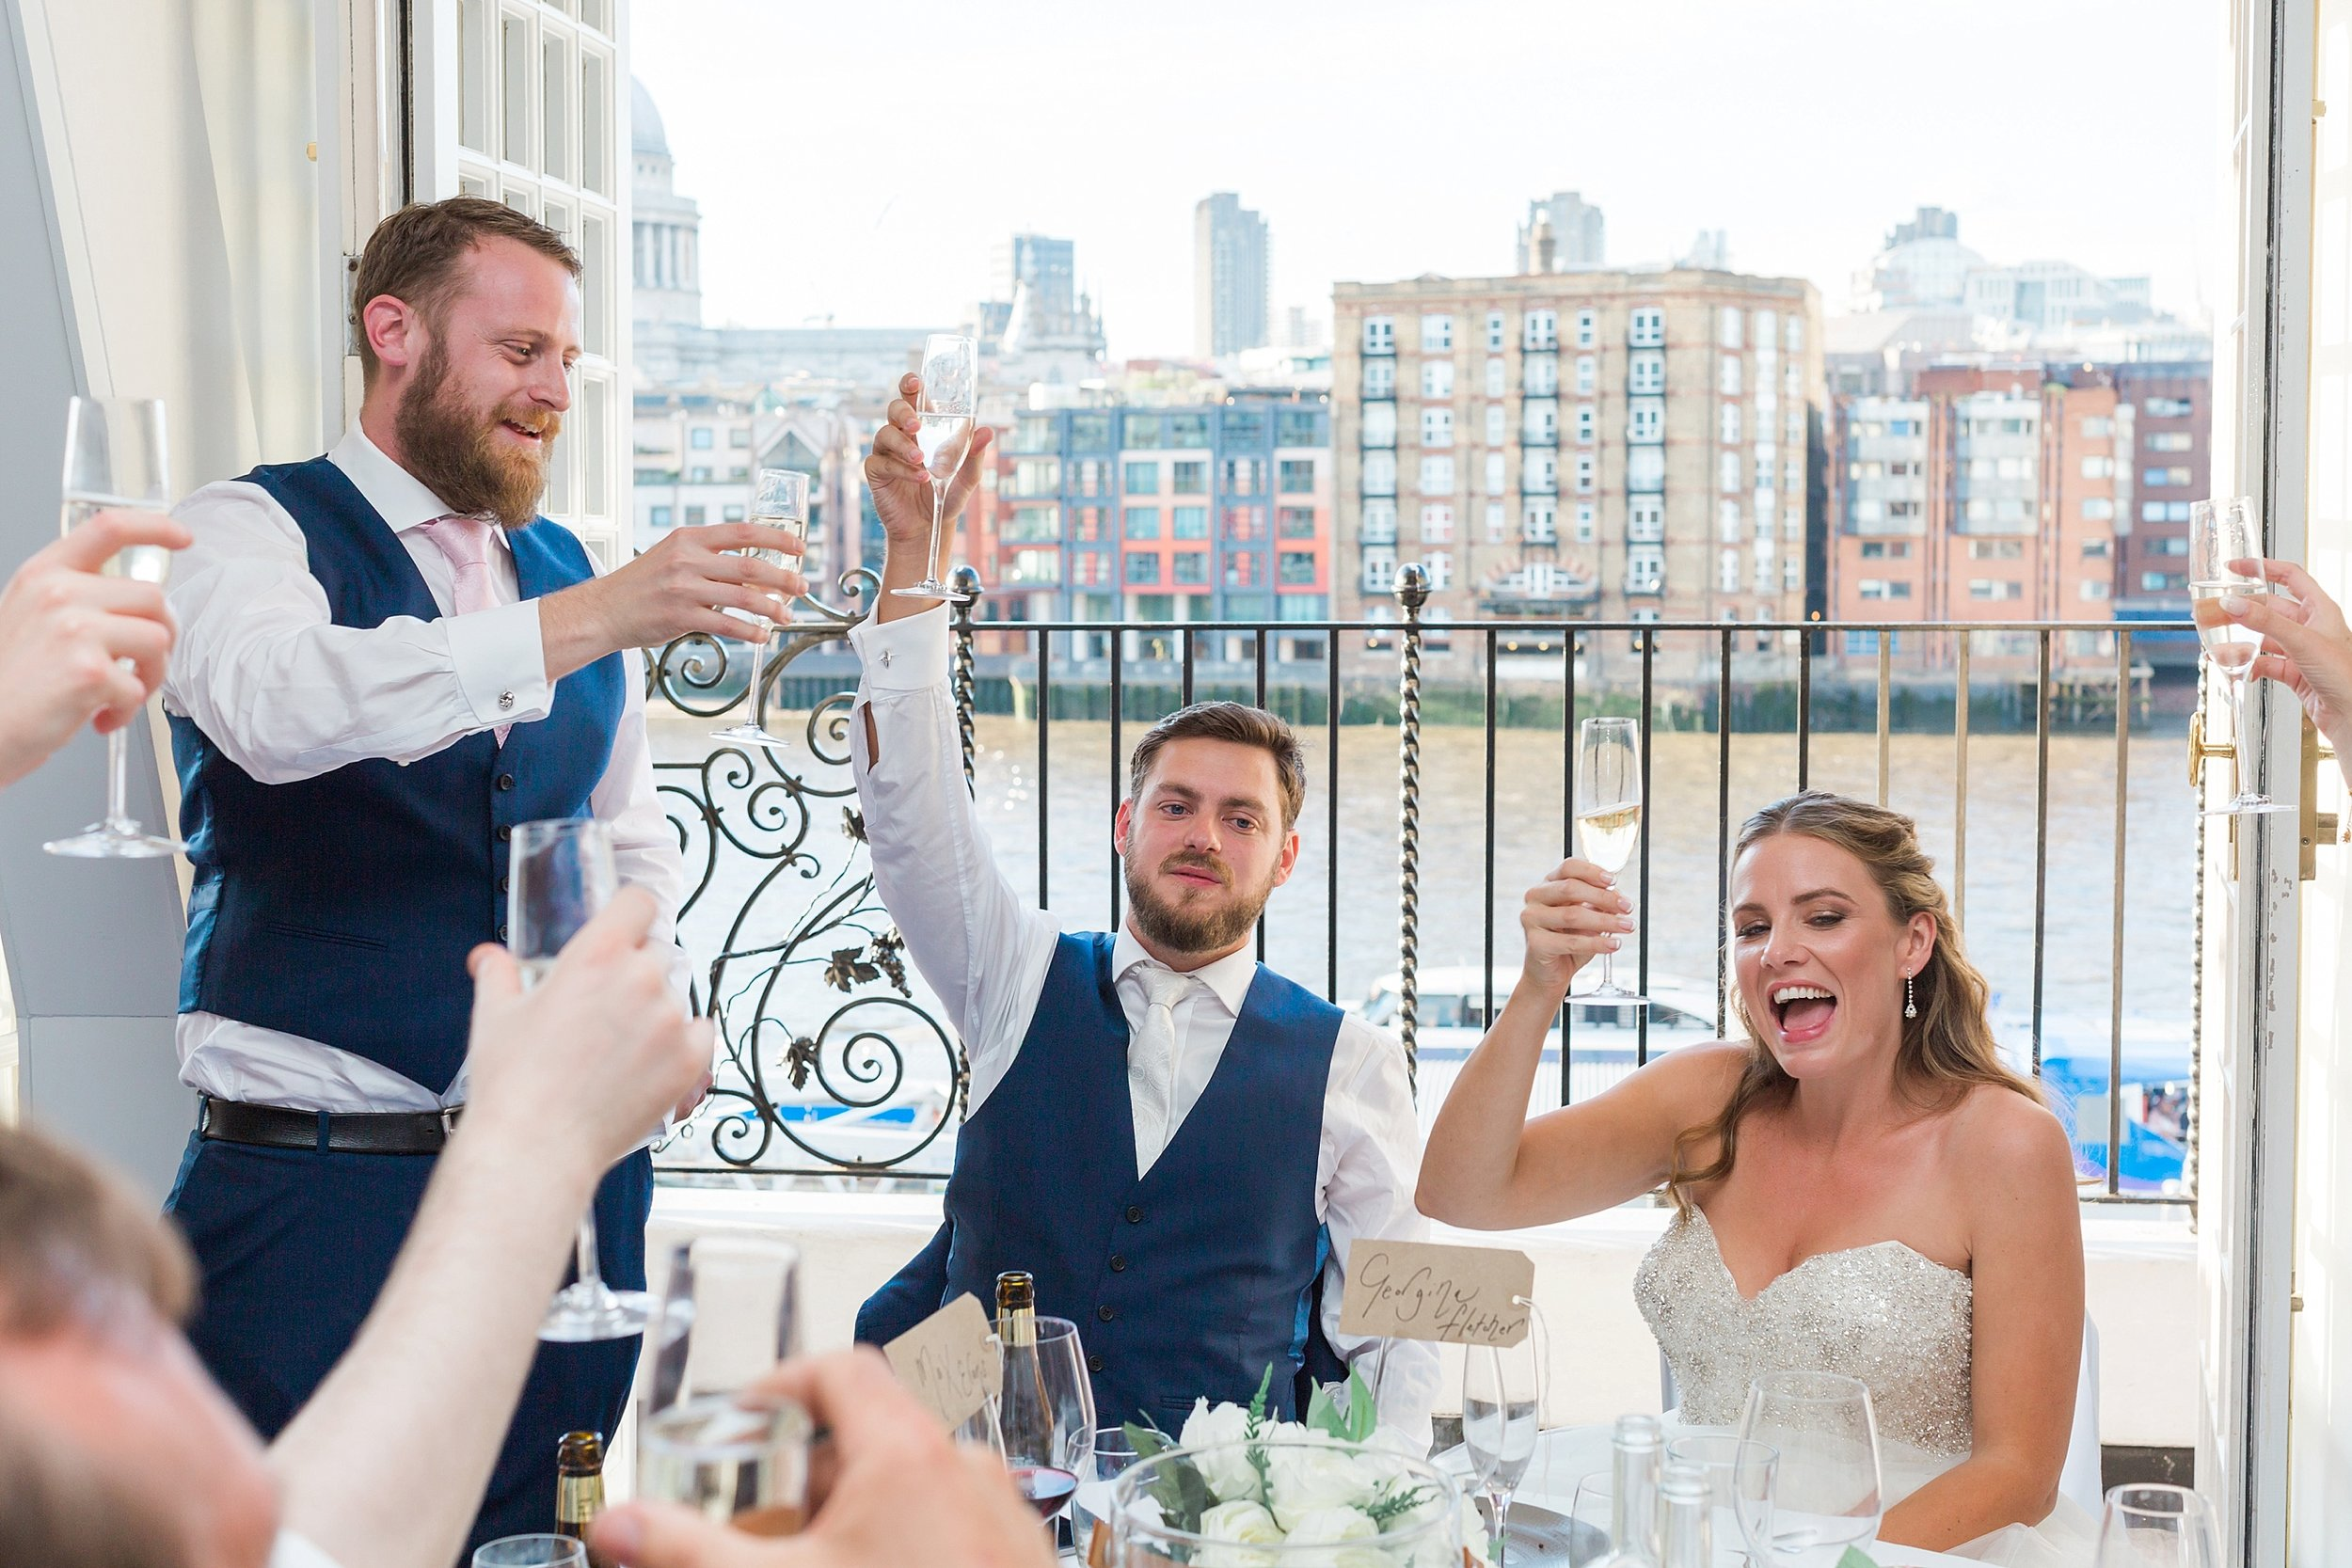 wedding-day-toasts.jpg